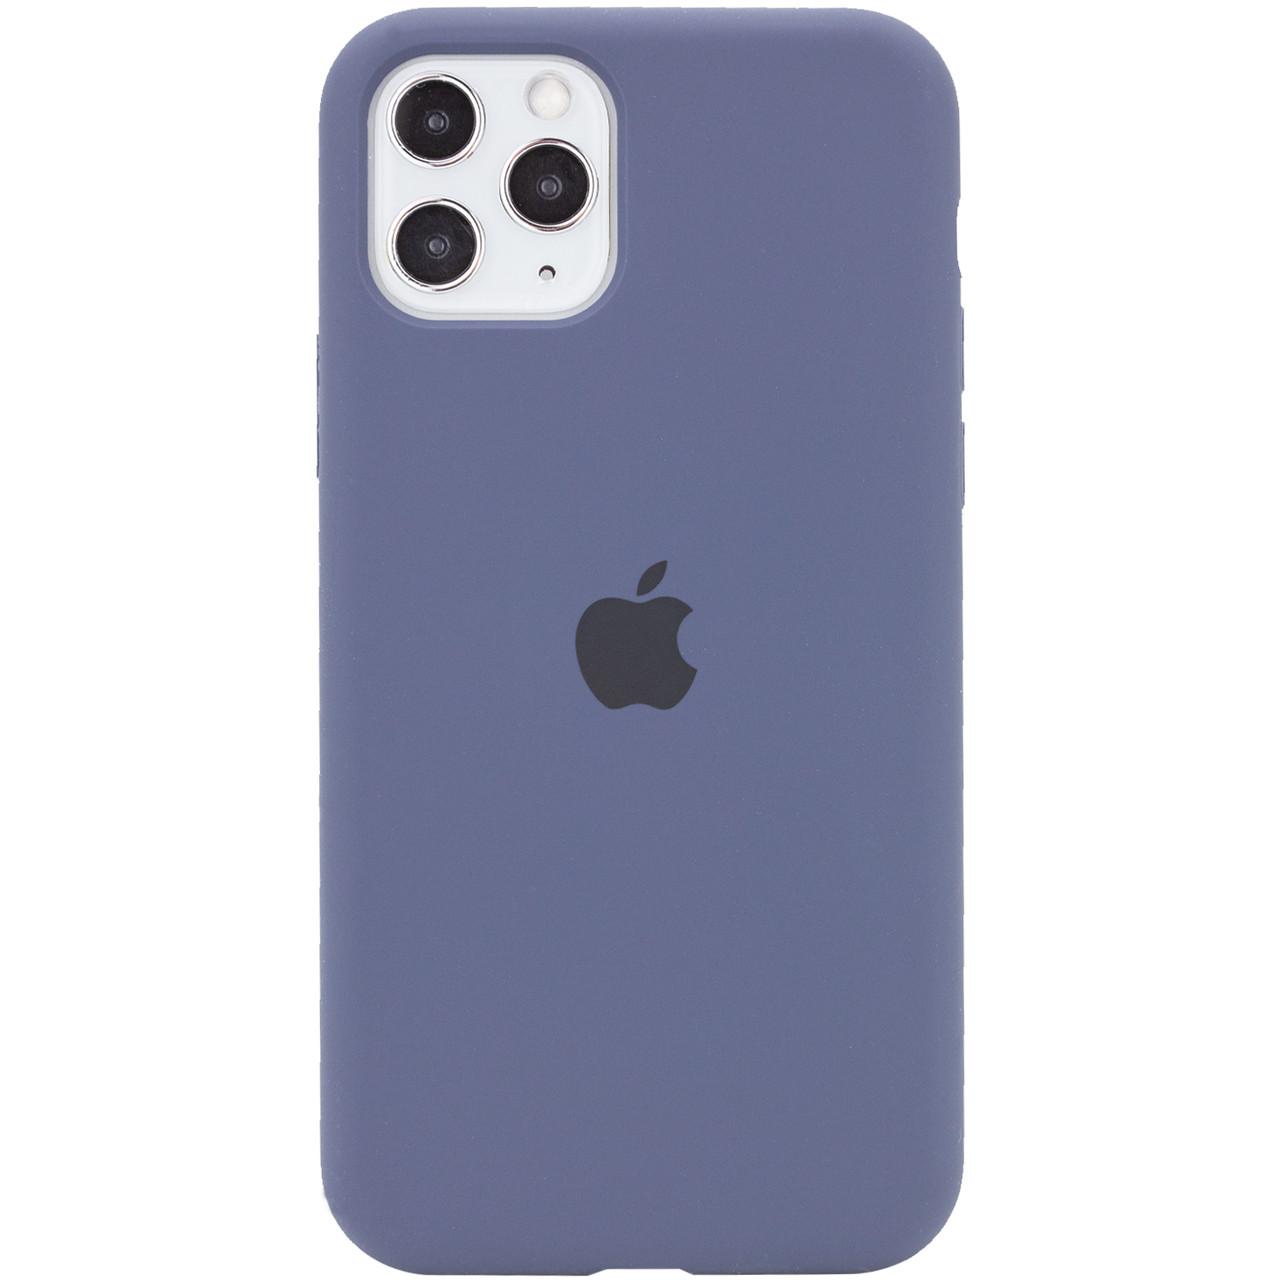 "Чехол Silicone Case Full Protective (AA) для Apple iPhone 11 Pro Max (6.5"")"